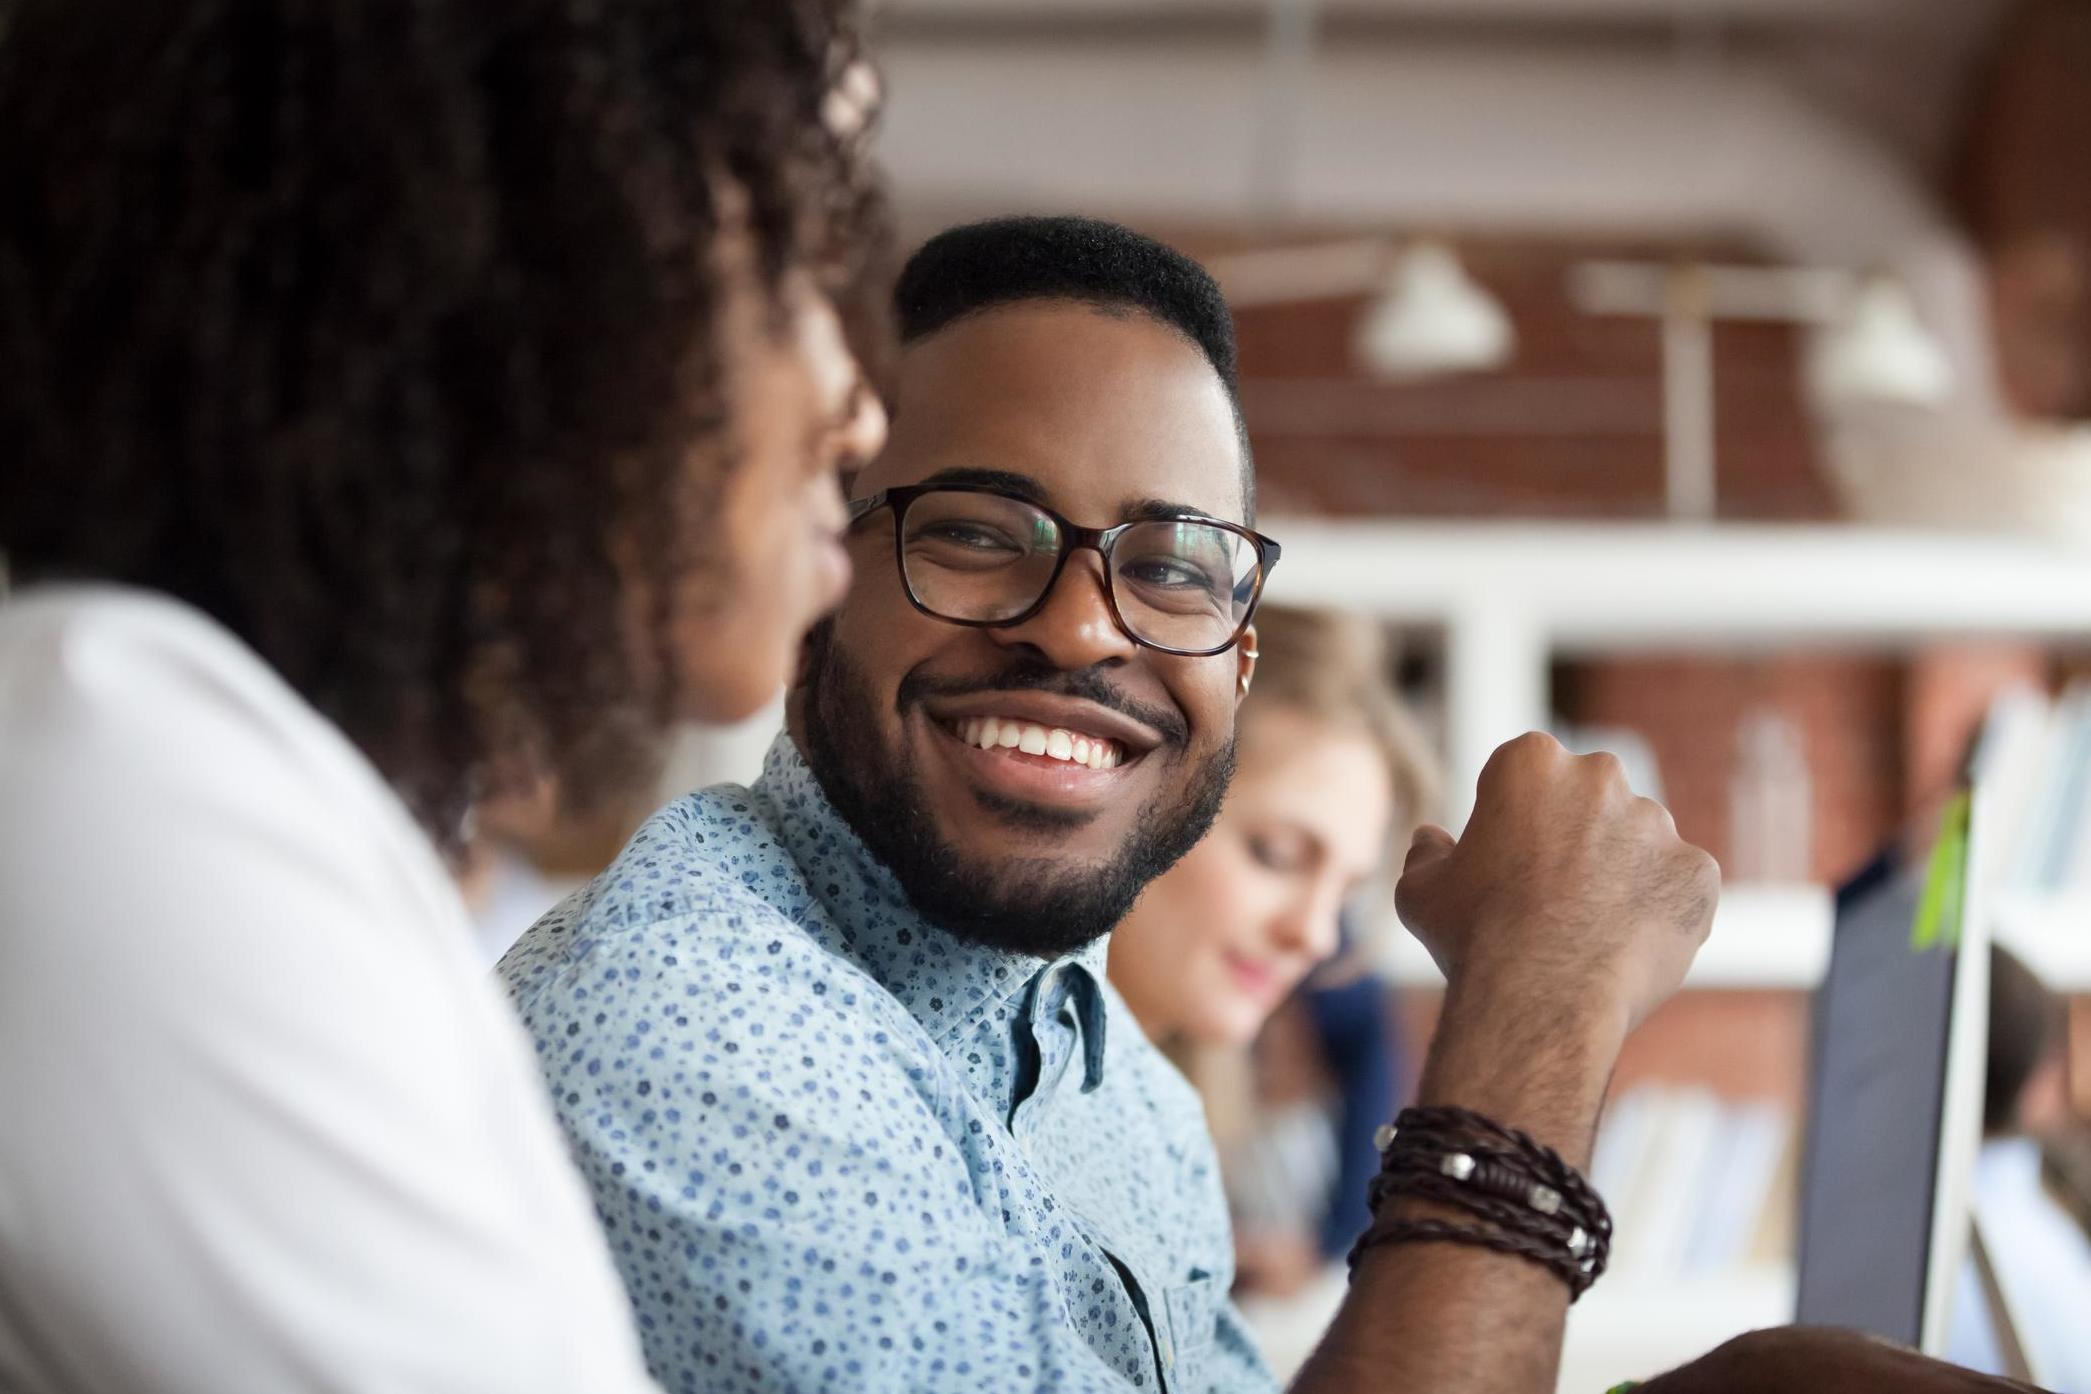 Most millennials 'struggle to make friends at work'